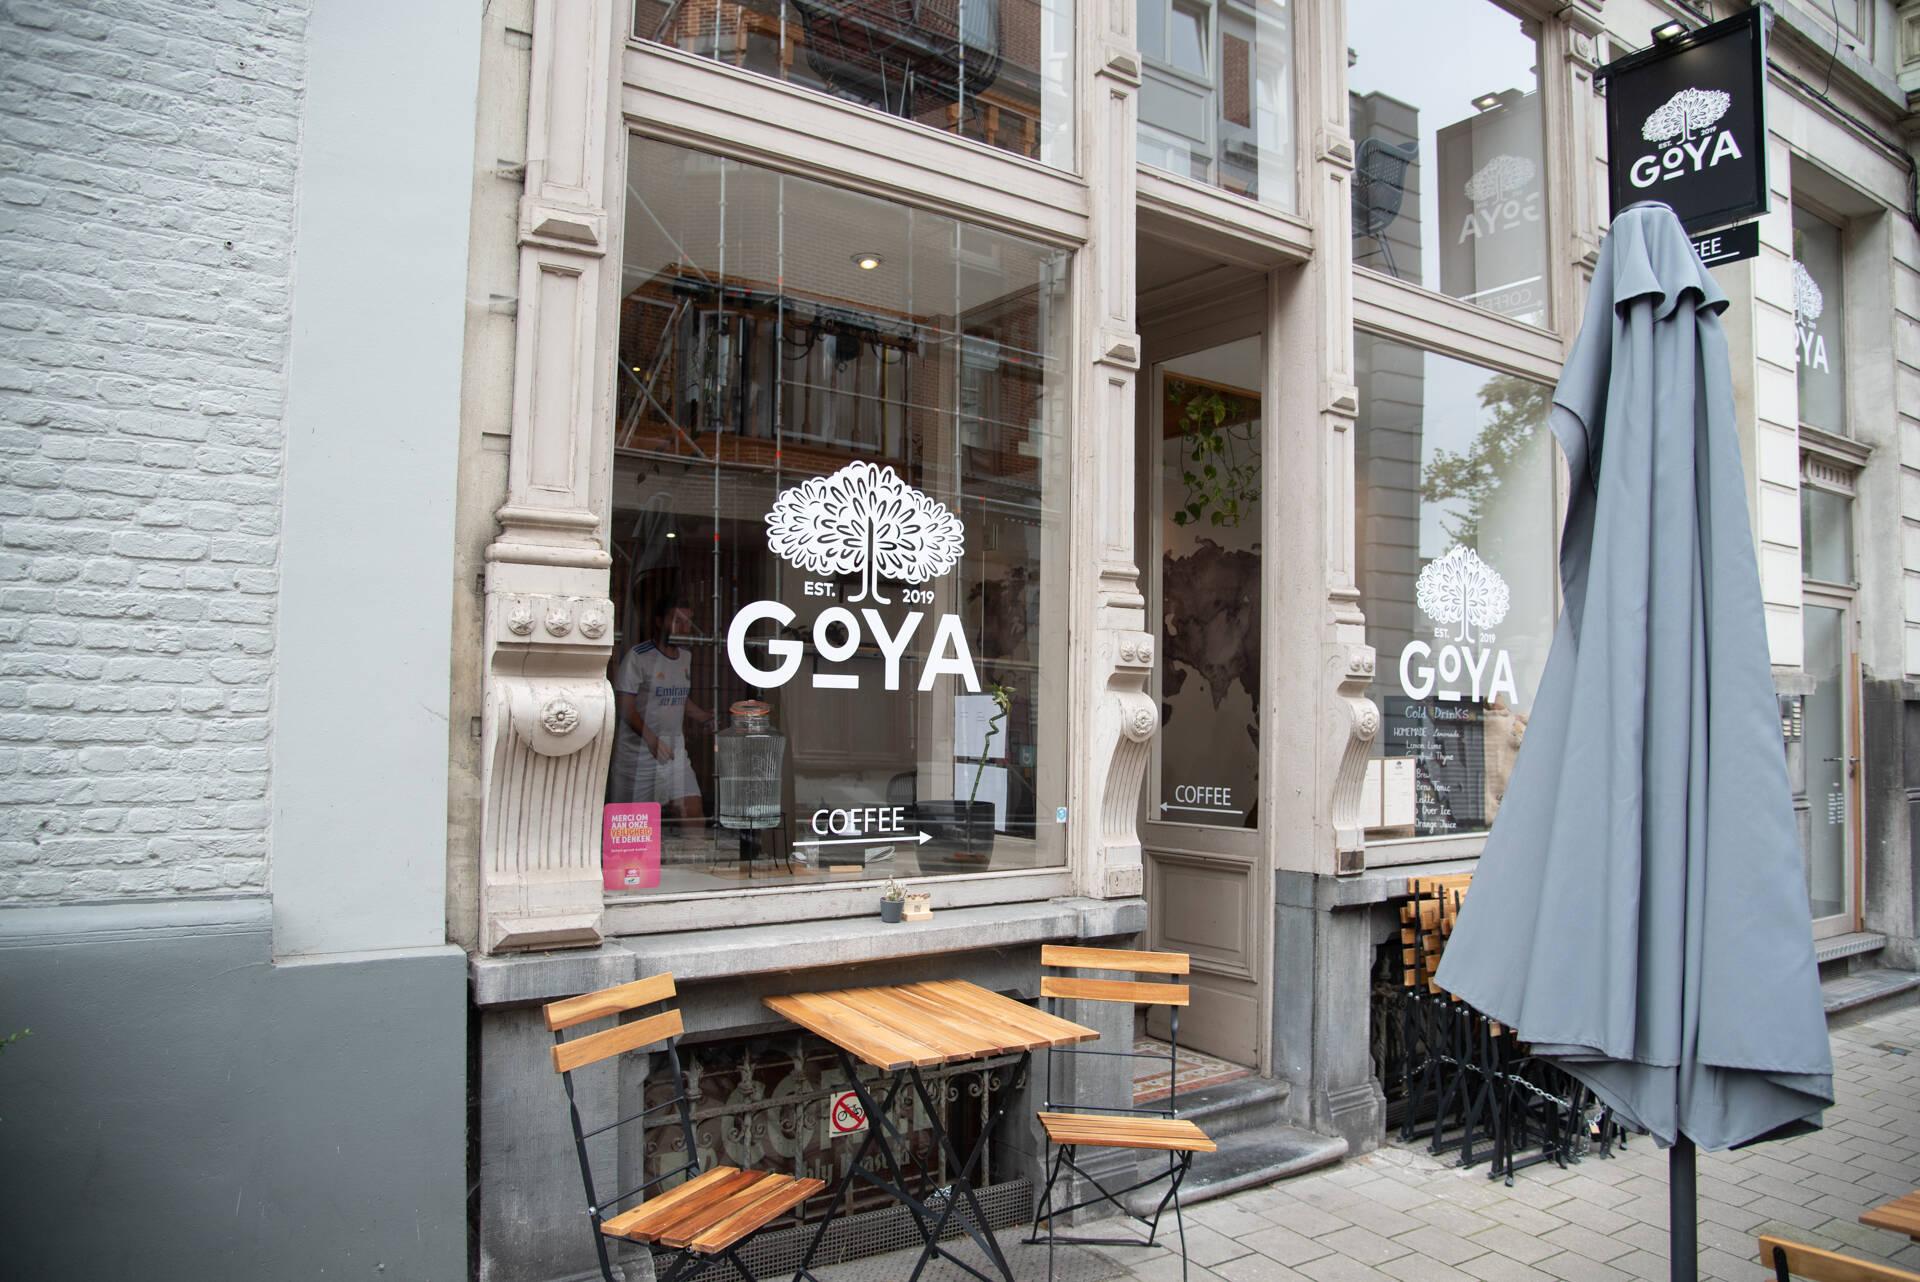 Goya Coffee in Gent